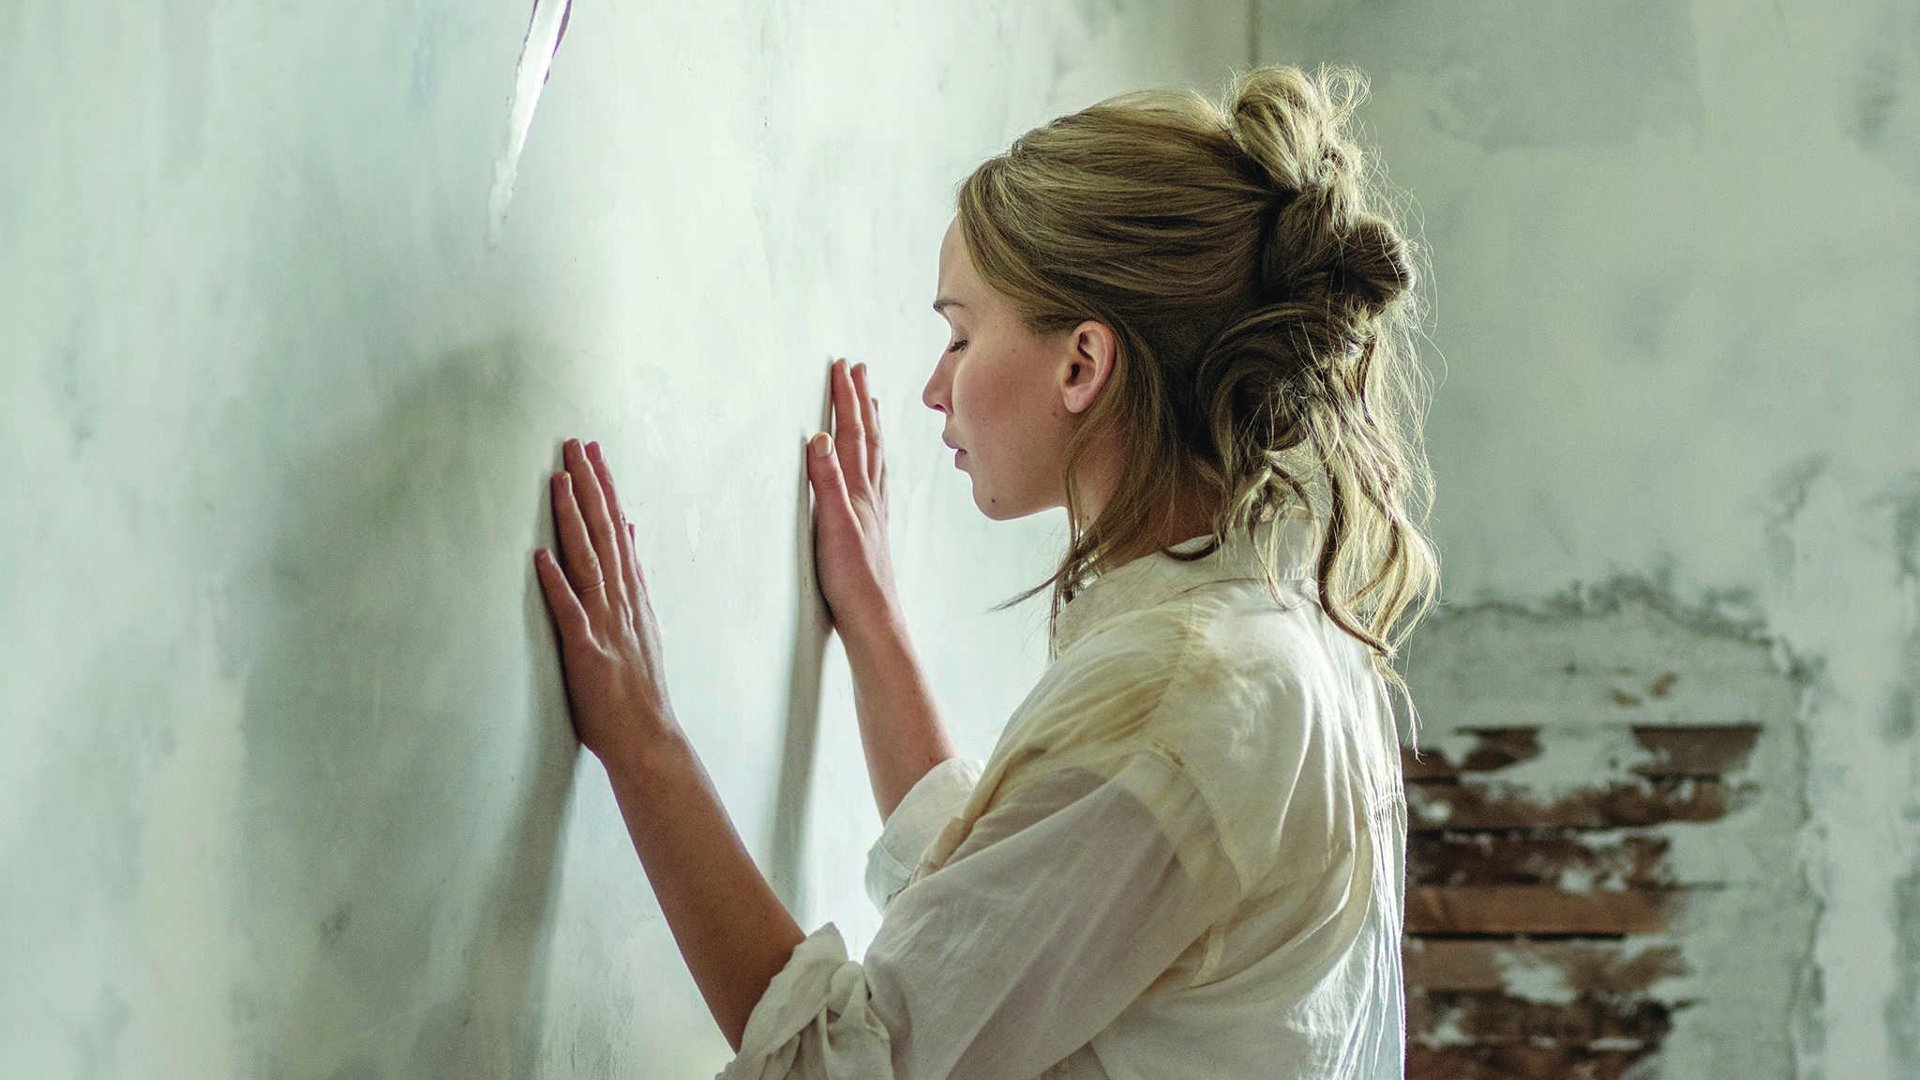 Mother 2017 - دارن آرونوفسکی | سینما، بیوگرافی و فیلم هایش